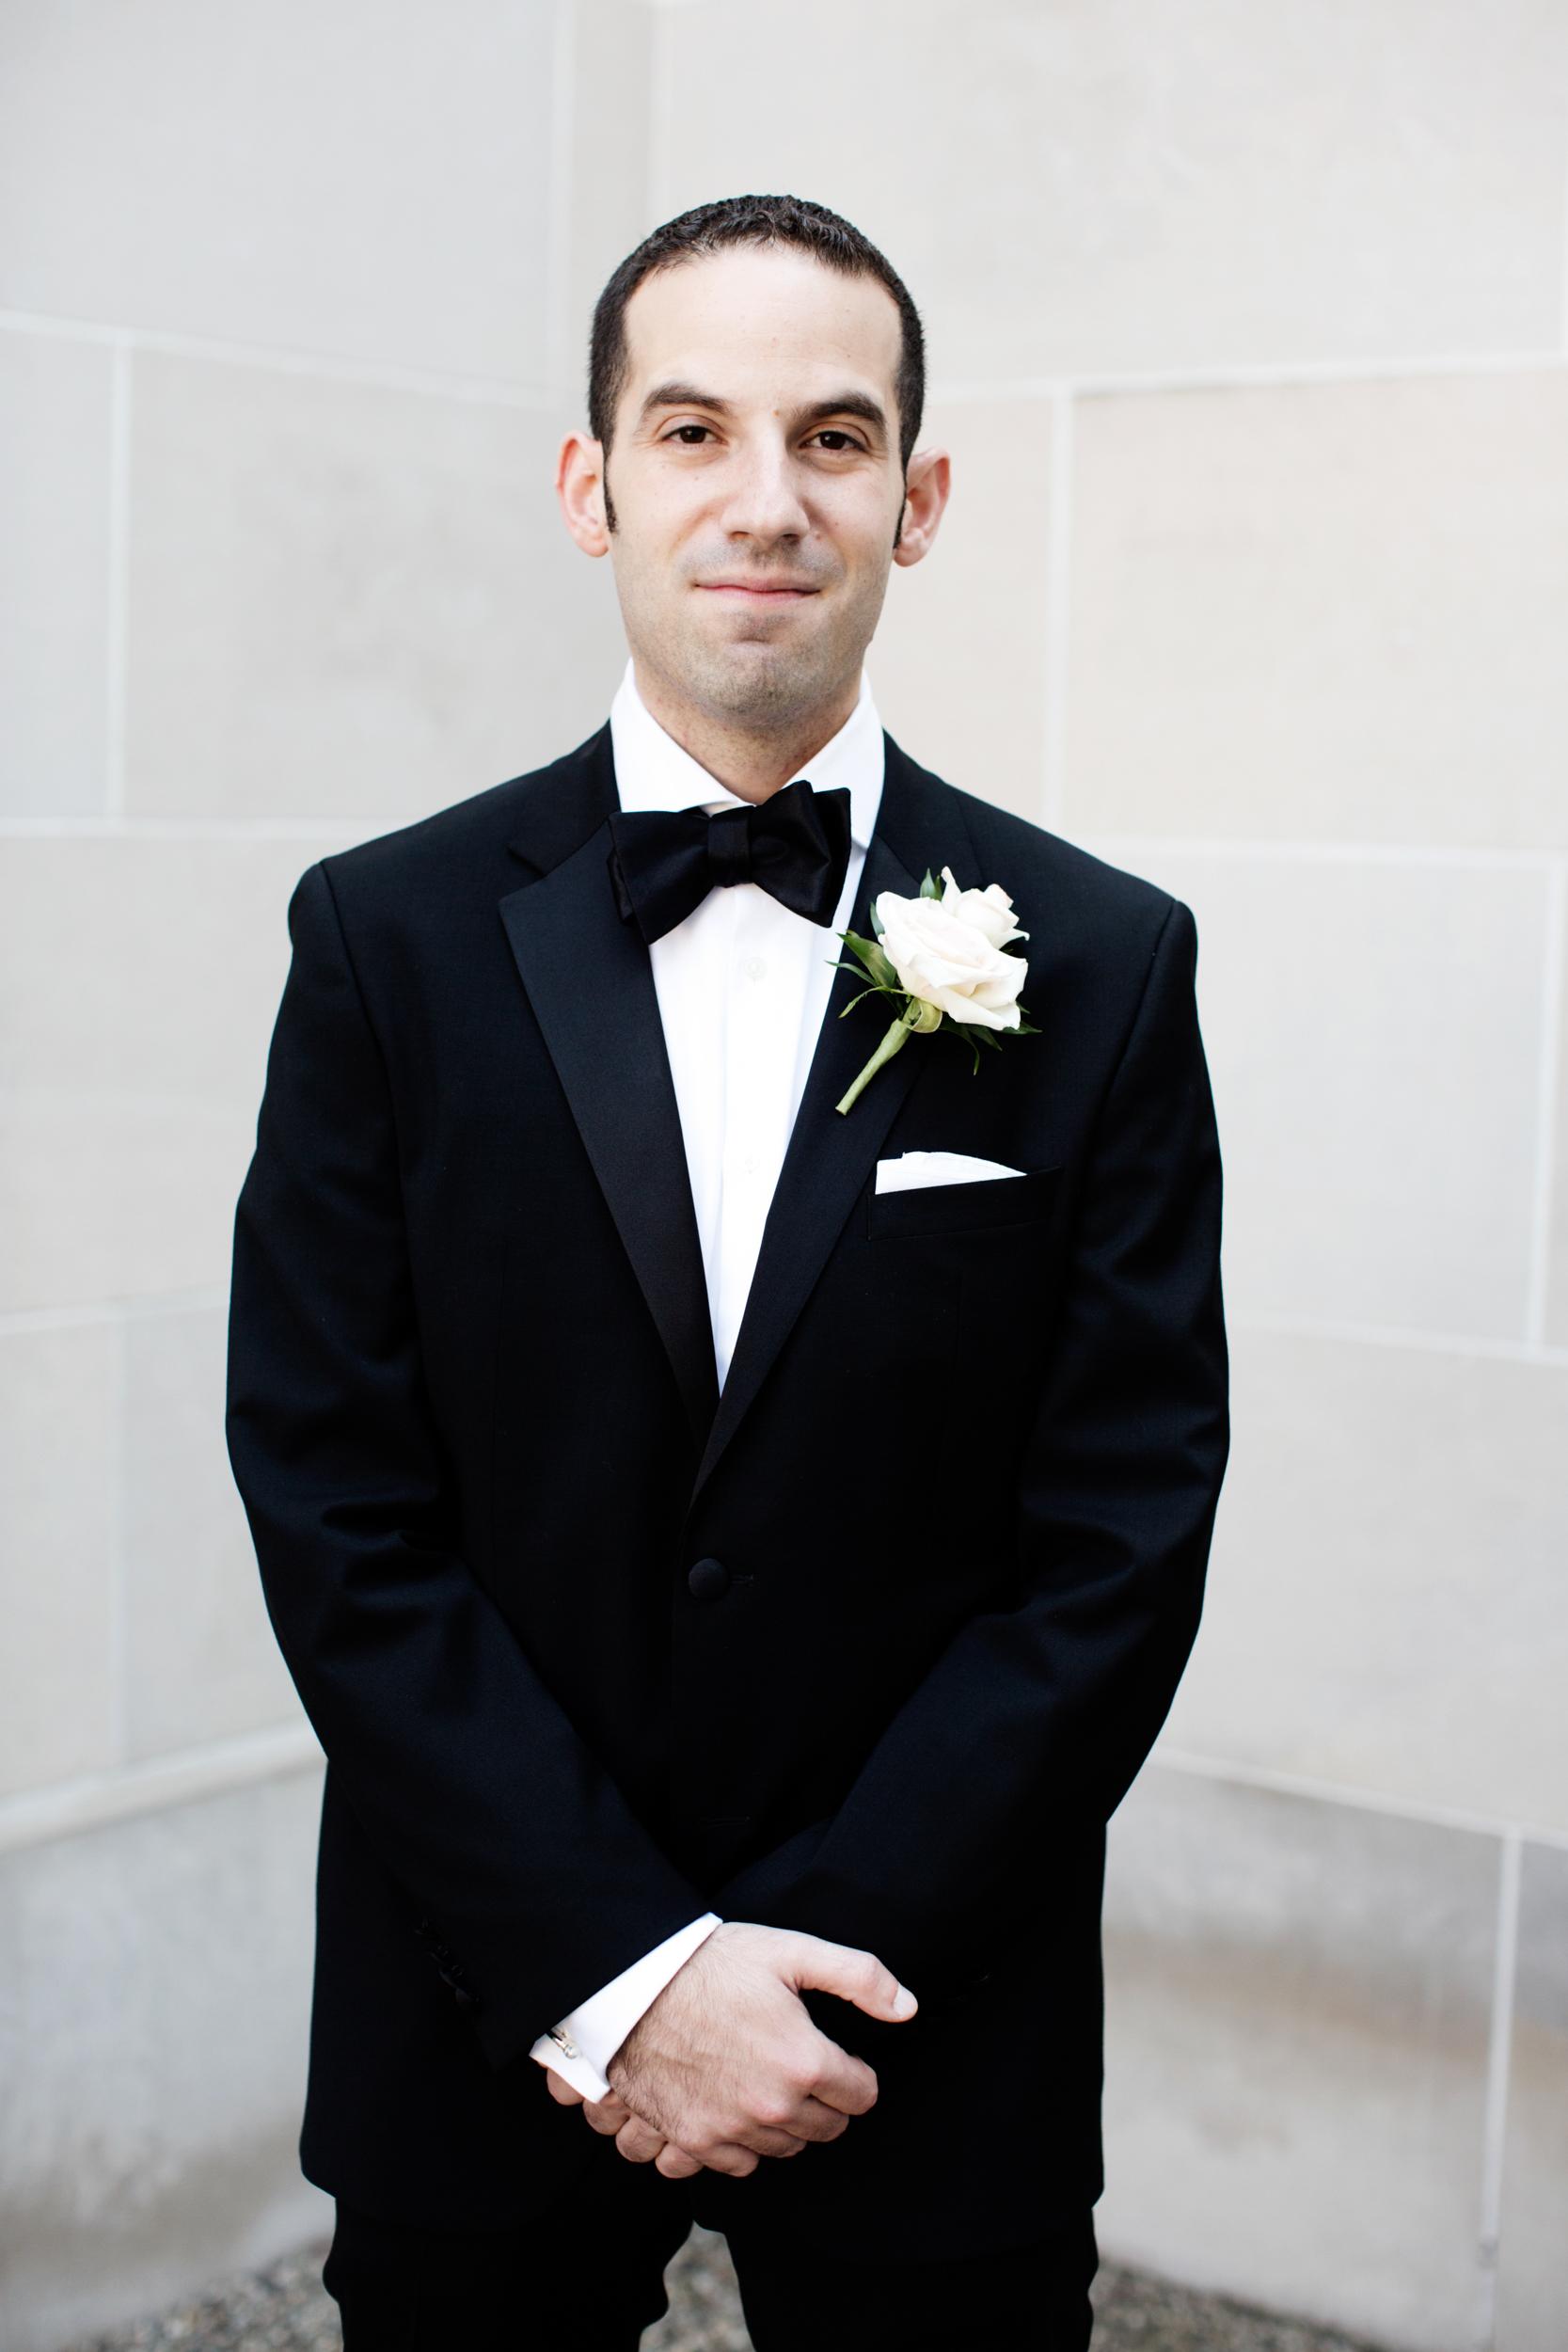 Ceci_New_York_Ceci_Style_Ceci_Johnson_Luxury_Lifestyle_Floral_Lace_Wedding_Letterpress_Inspiration_Design_Custom_Couture_Personalized_Invitations_-134.jpg